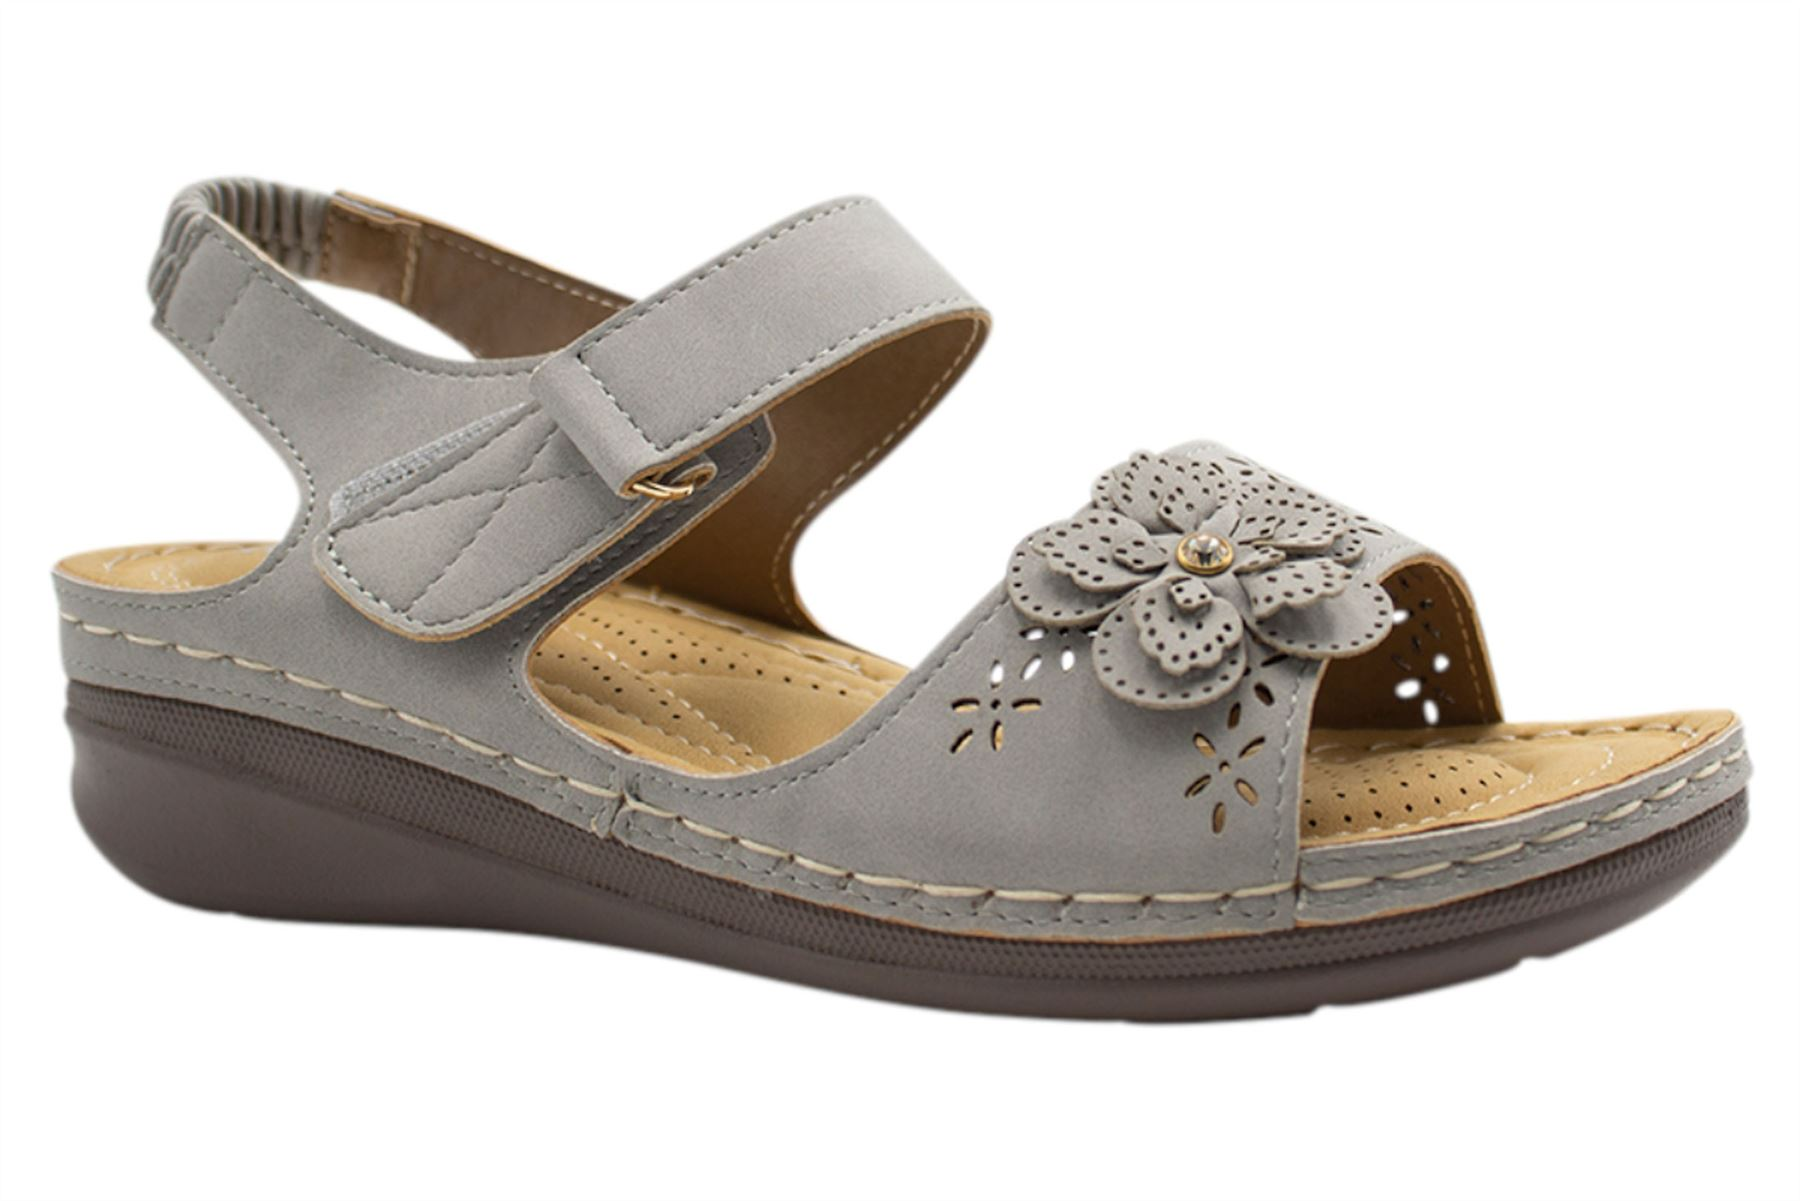 Ladies-Sandals-Womens-Mid-Heel-Comfort-Summer-Beach-Casual-Wear miniatura 26